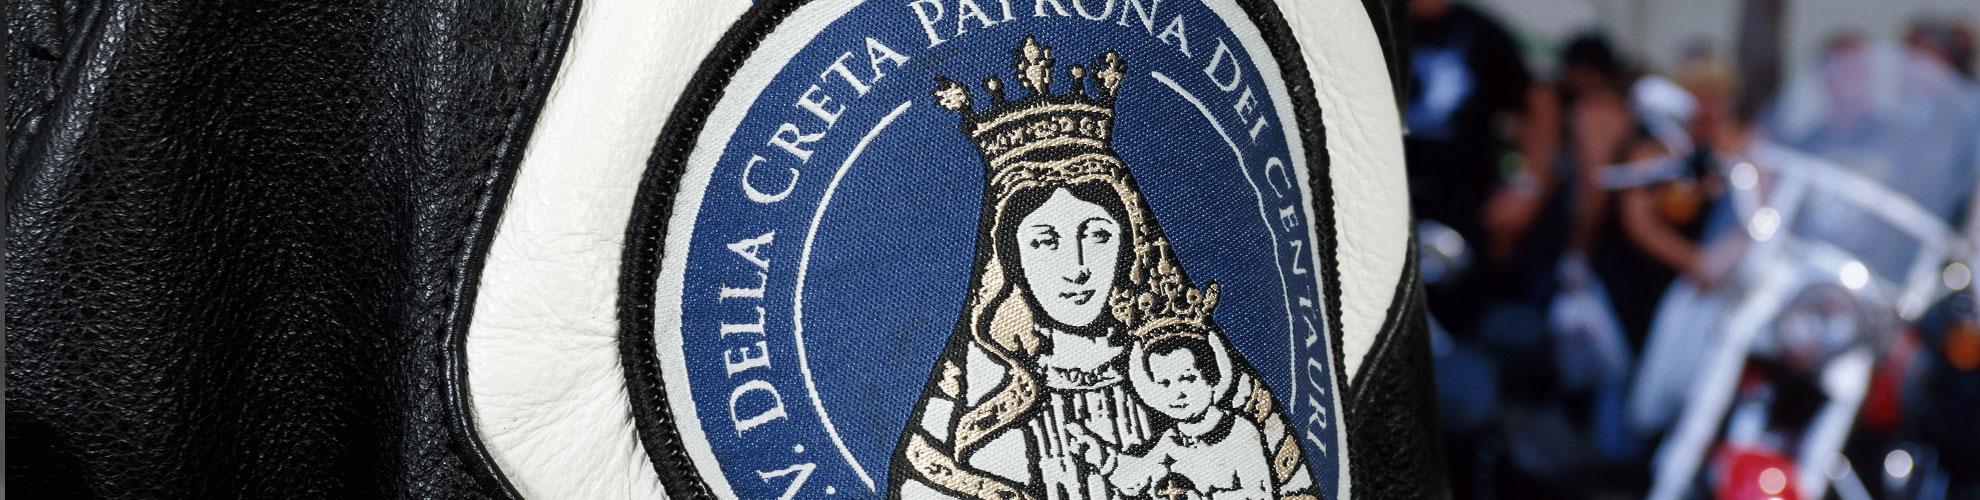 Beata Vergine della Creta – Schutzpatronin der Motorradfahrer aus Italien